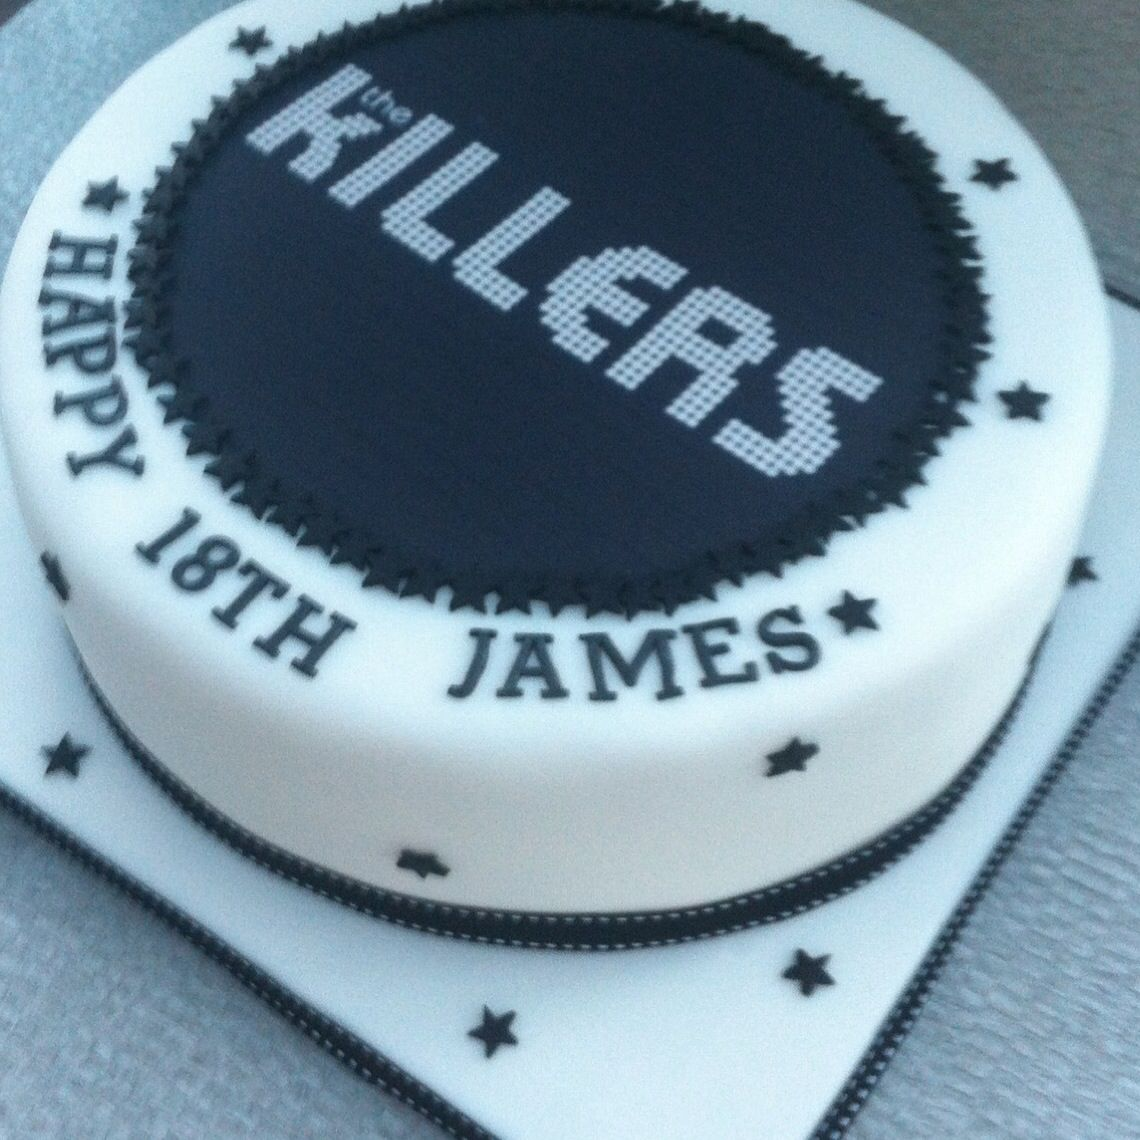 Killers cake happy birthday james cupkates pinterest cake killers cake happy birthday james altavistaventures Choice Image